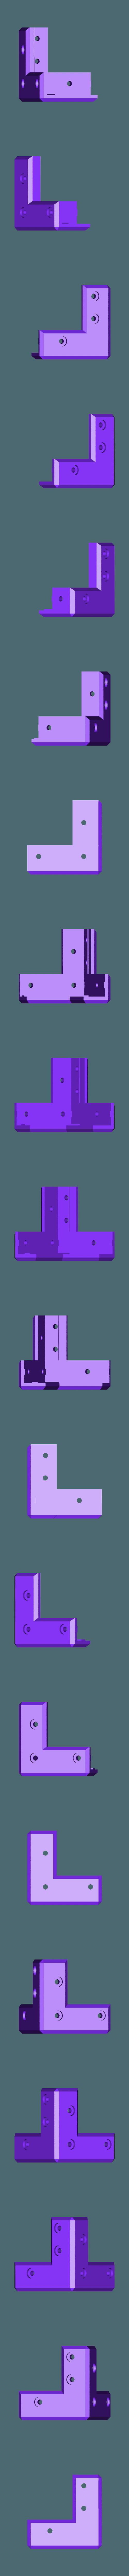 2020CornerC-NOTAP.stl Download free STL file 2020 Profile Aluminum 3D Printable Erector Set • 3D printer model, adamjvr